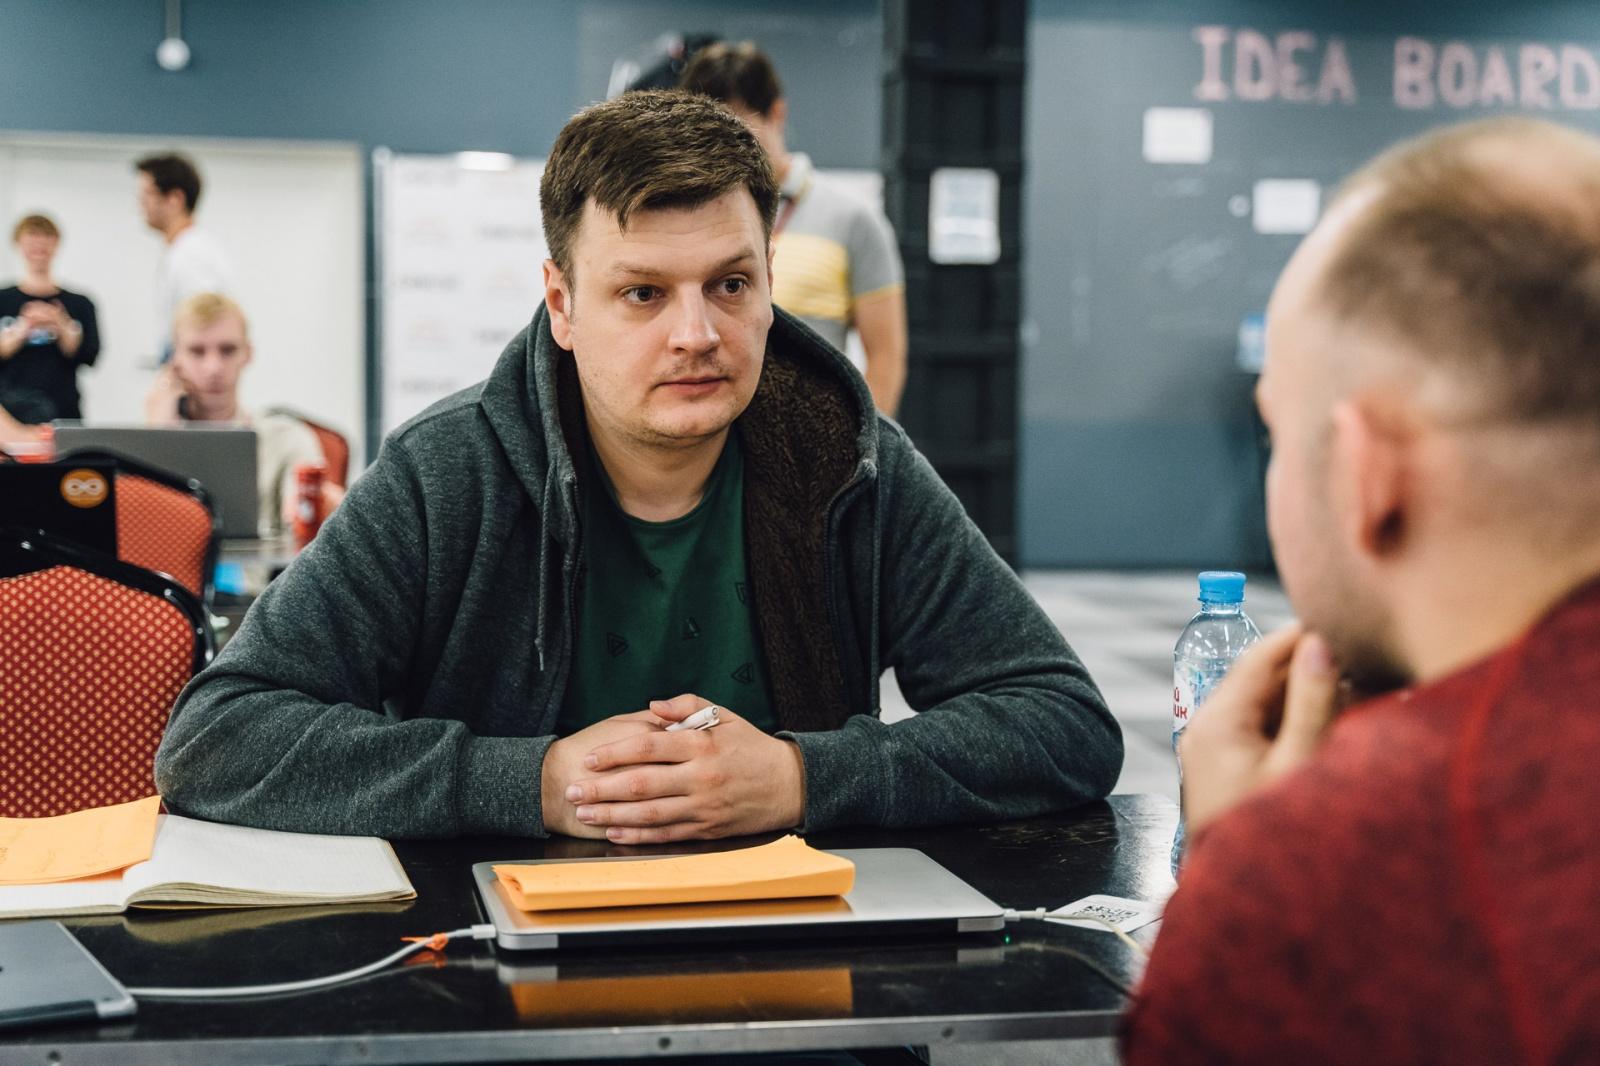 Артём Галонский, СТО БюроБюро: «Я против такого понятия, как DevOps-инженер» - 3